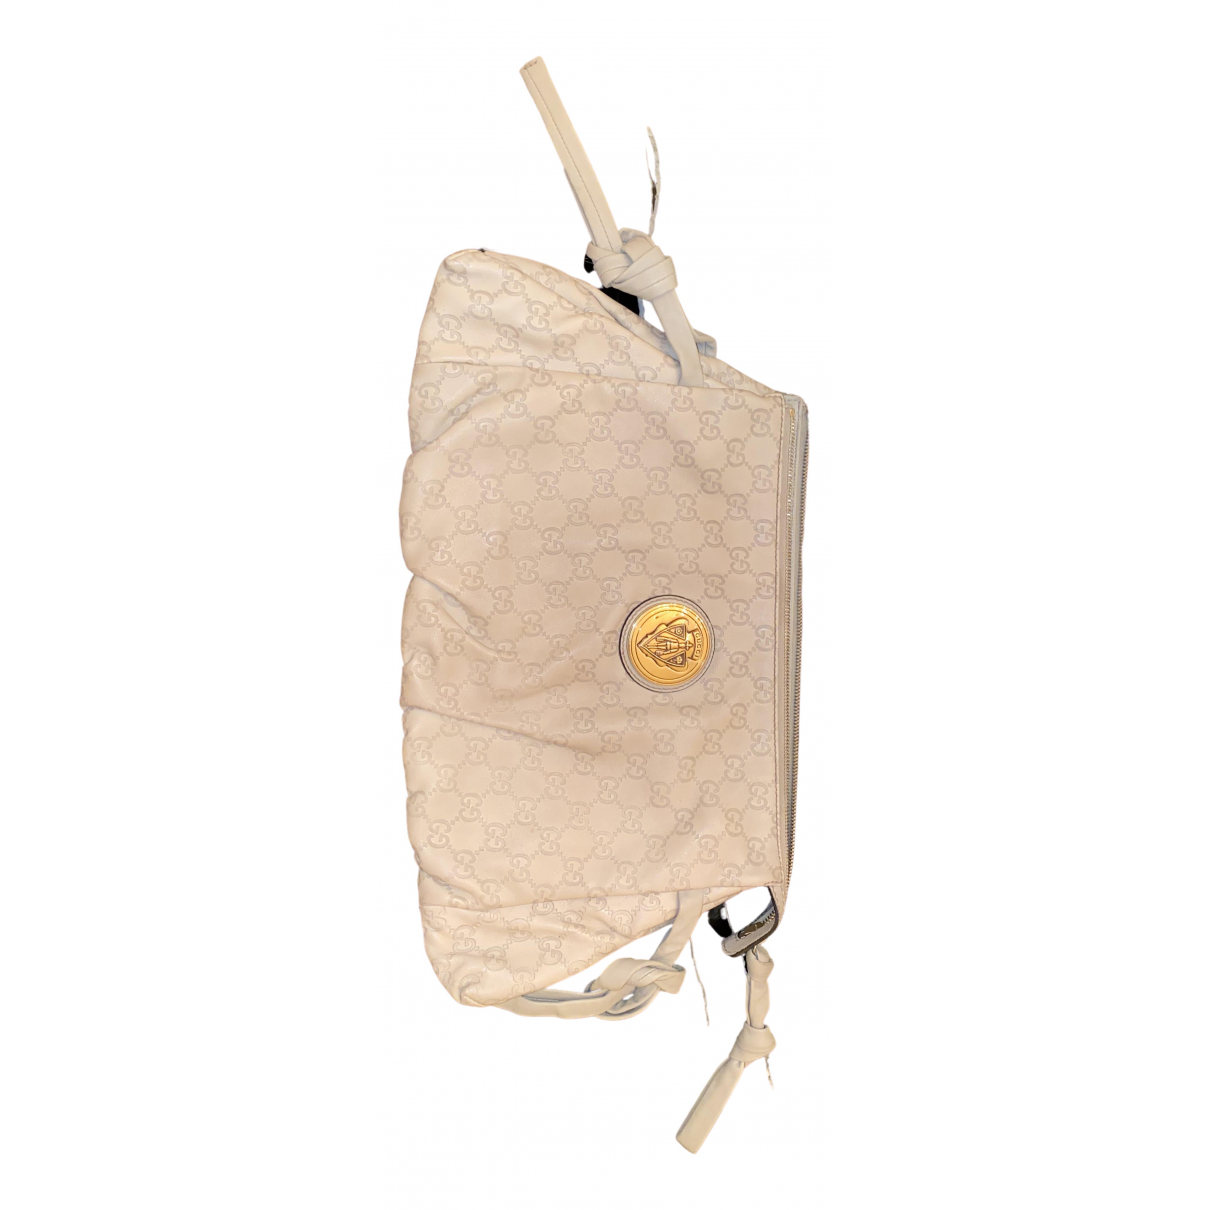 Gucci Hysteria Beige Leather Clutch bag for Women N